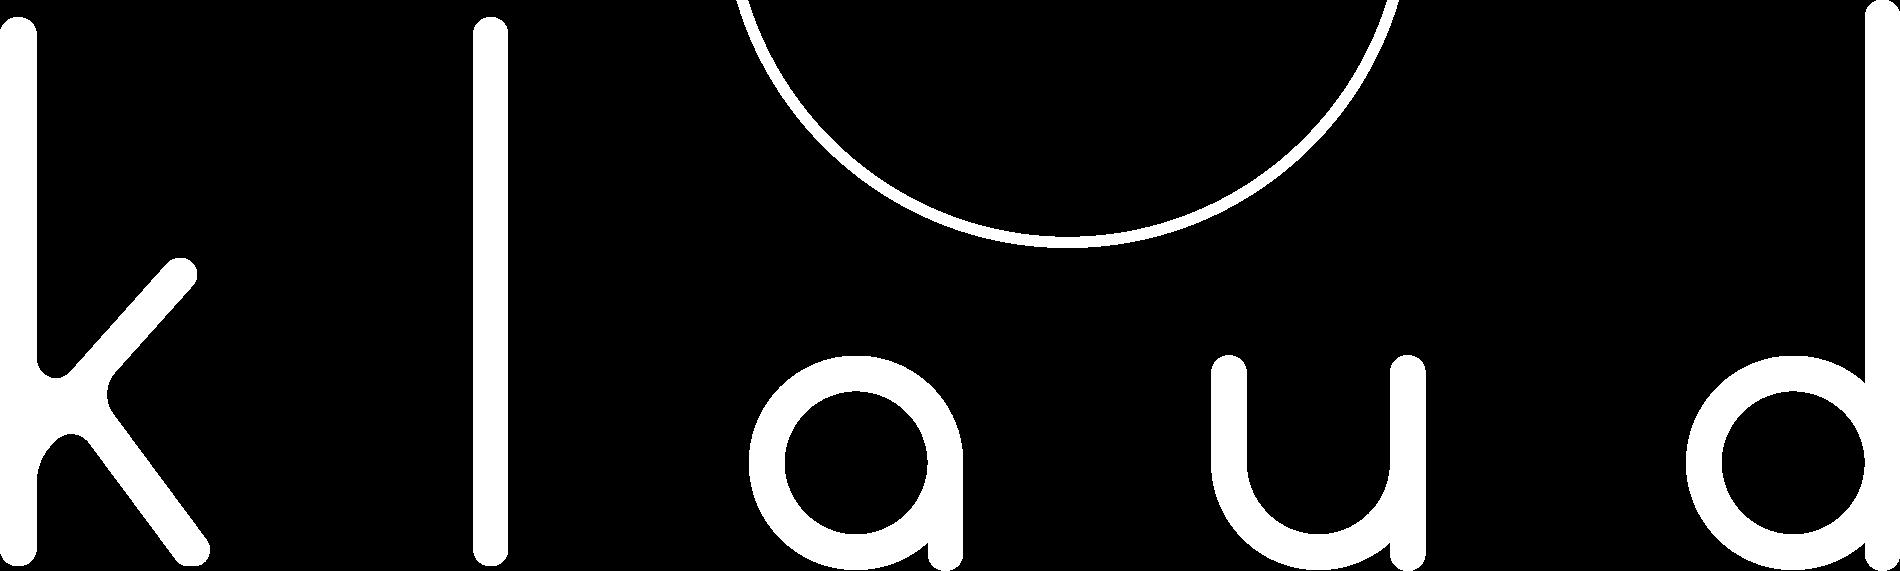 klaud_logo_transparent_bg-2menu